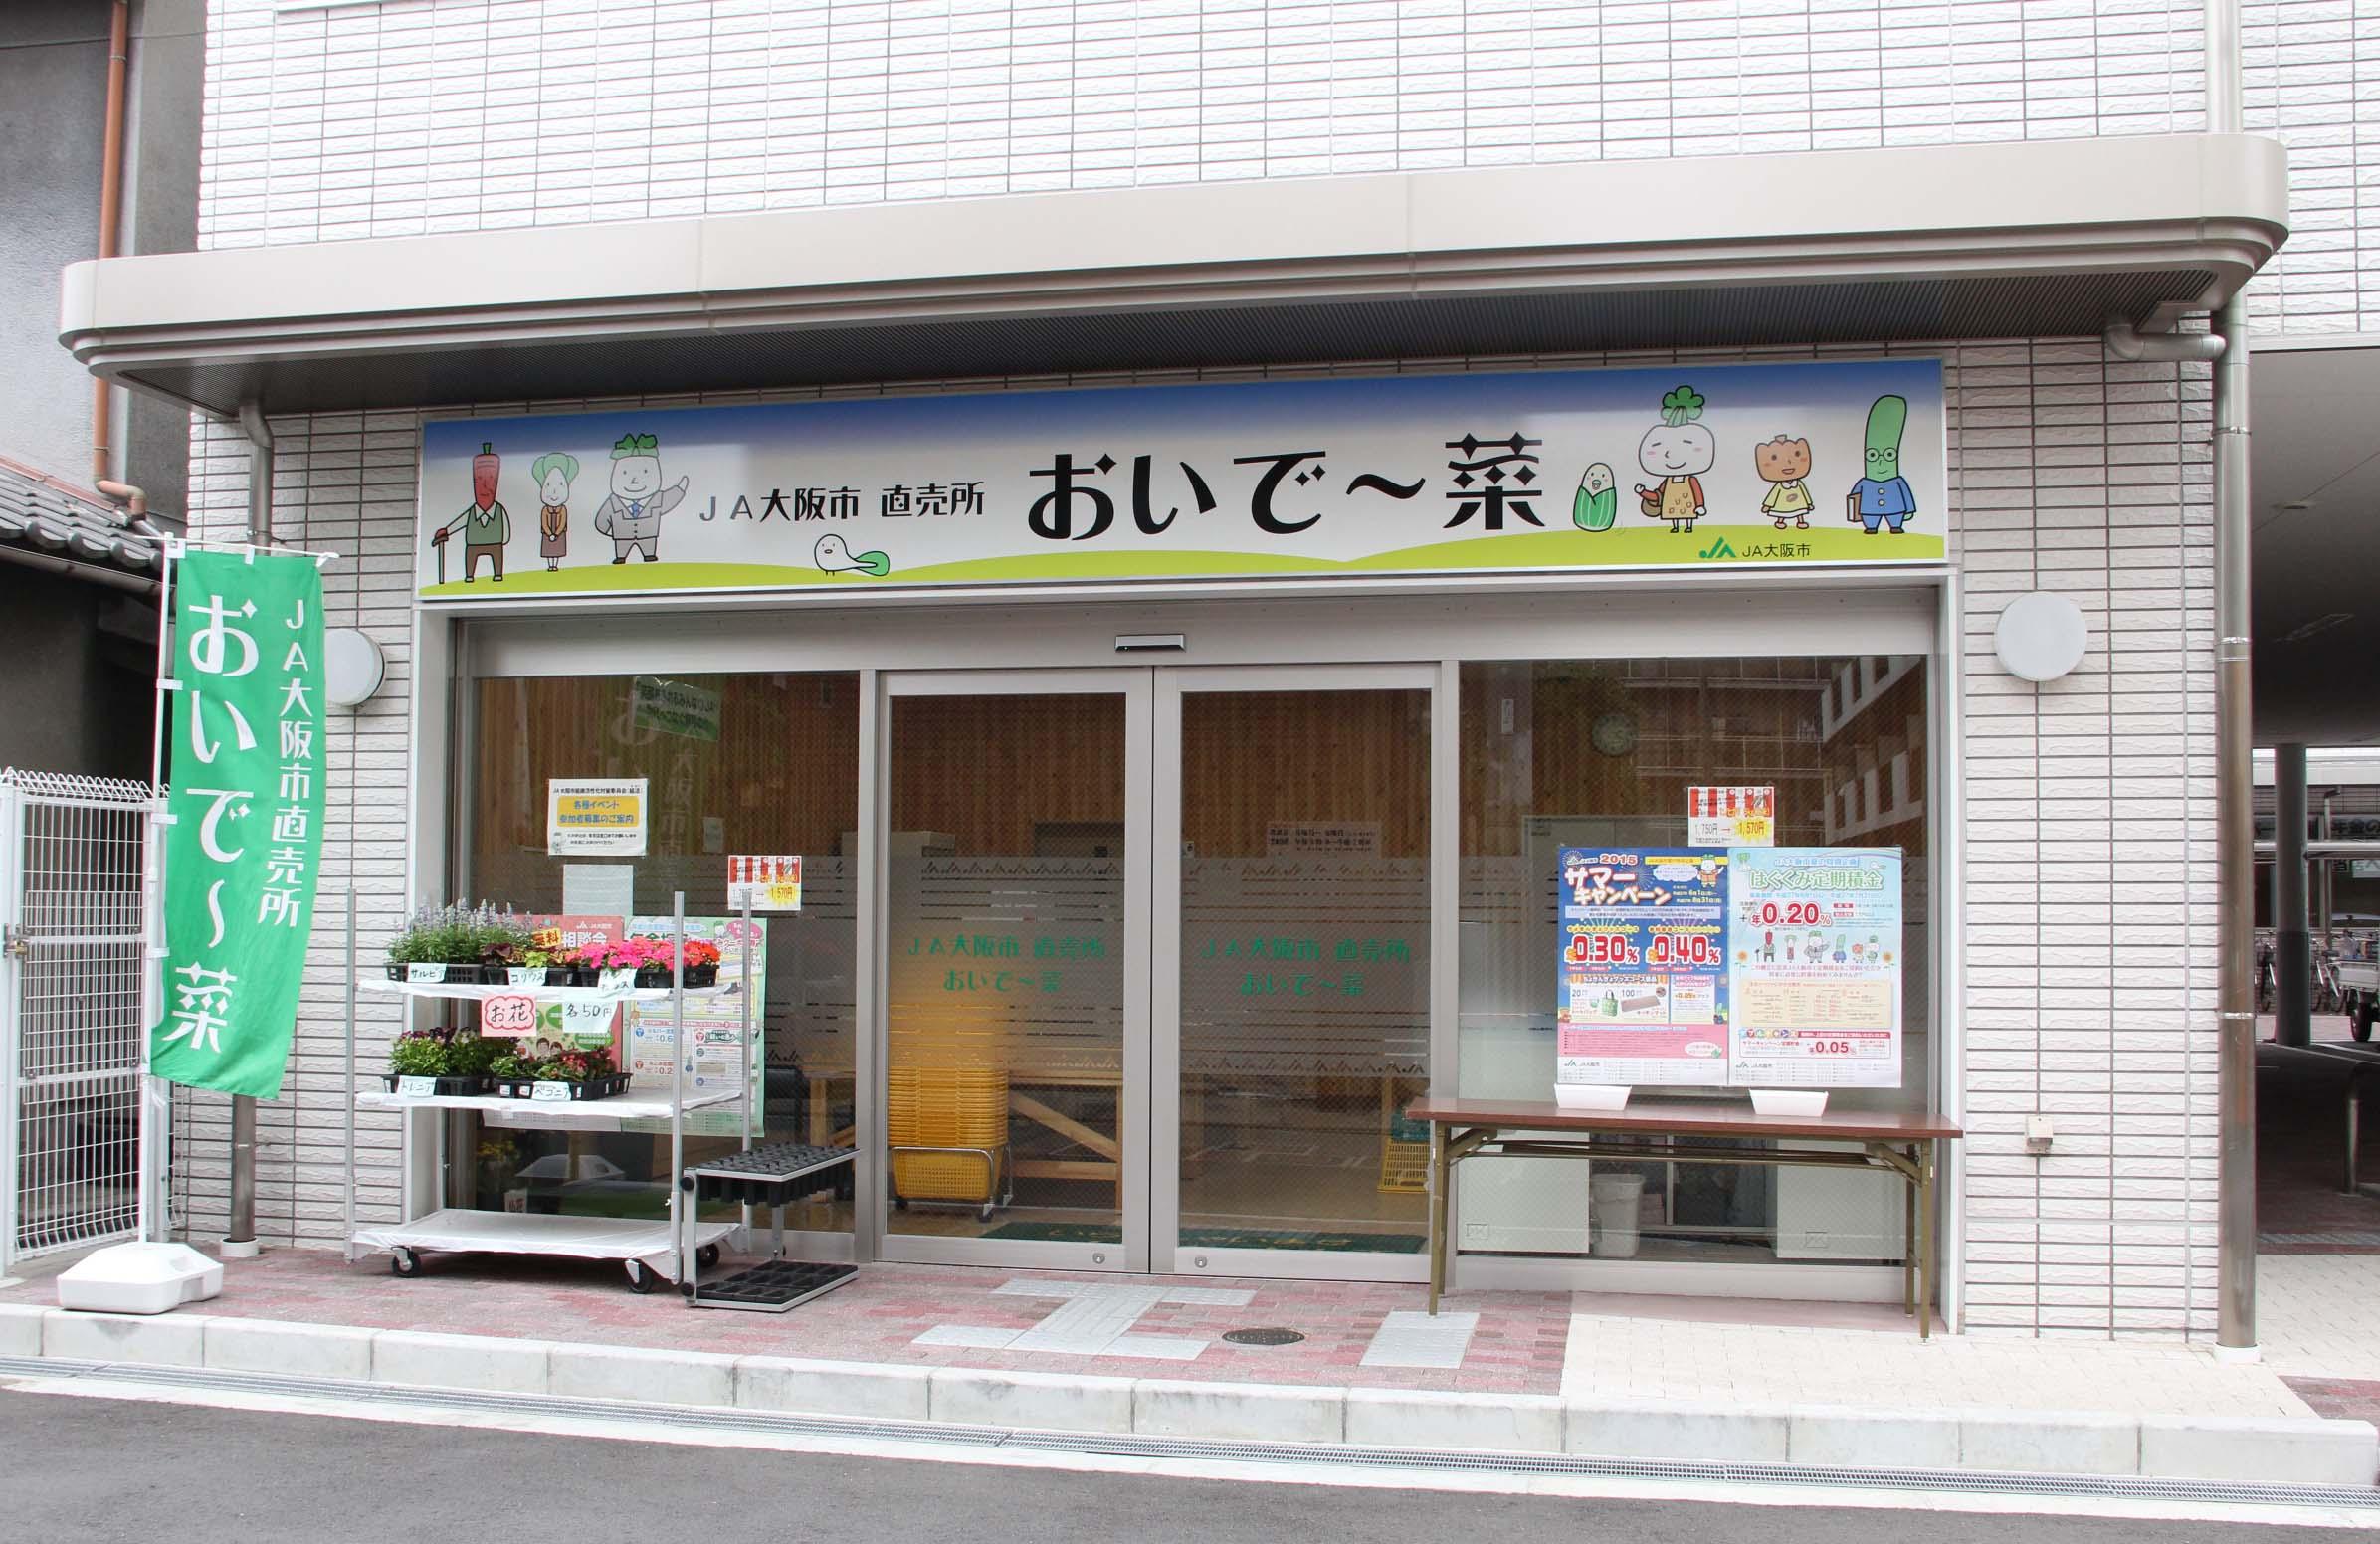 JA大阪市 直売所 おいで~菜 本店